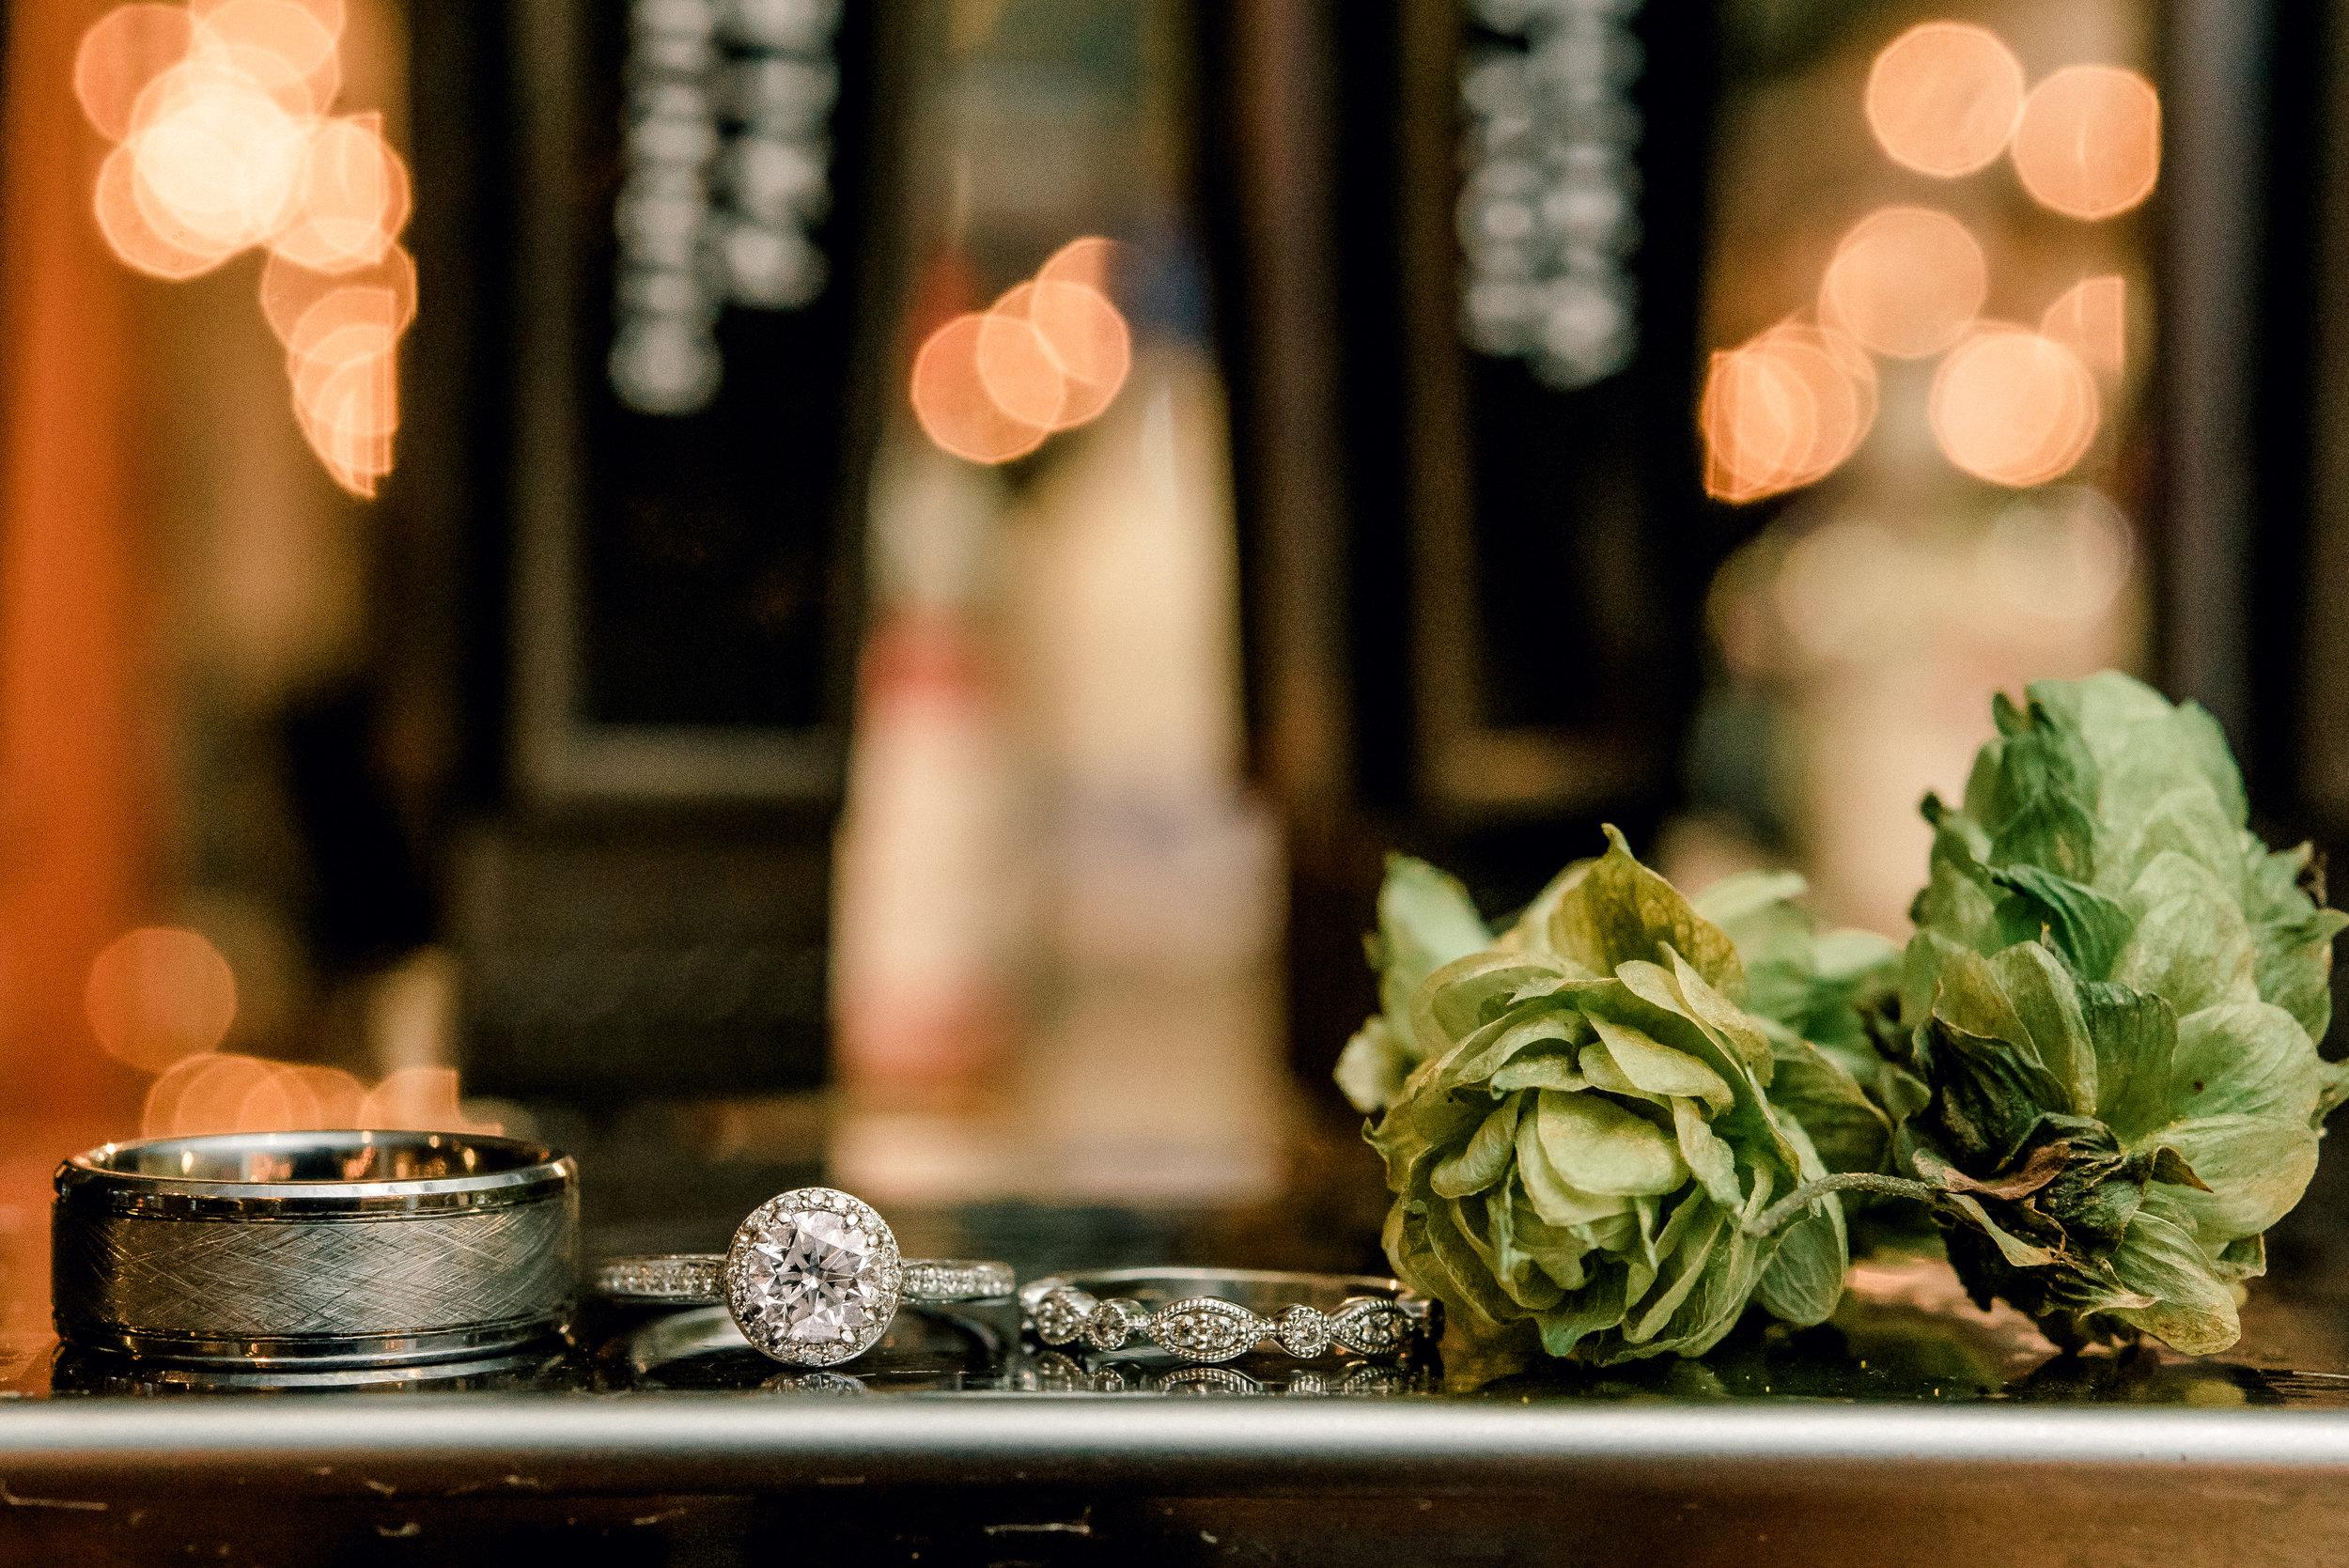 cleveland-wedding-photographer-great-lakes-brewing-arcade-0006.jpg